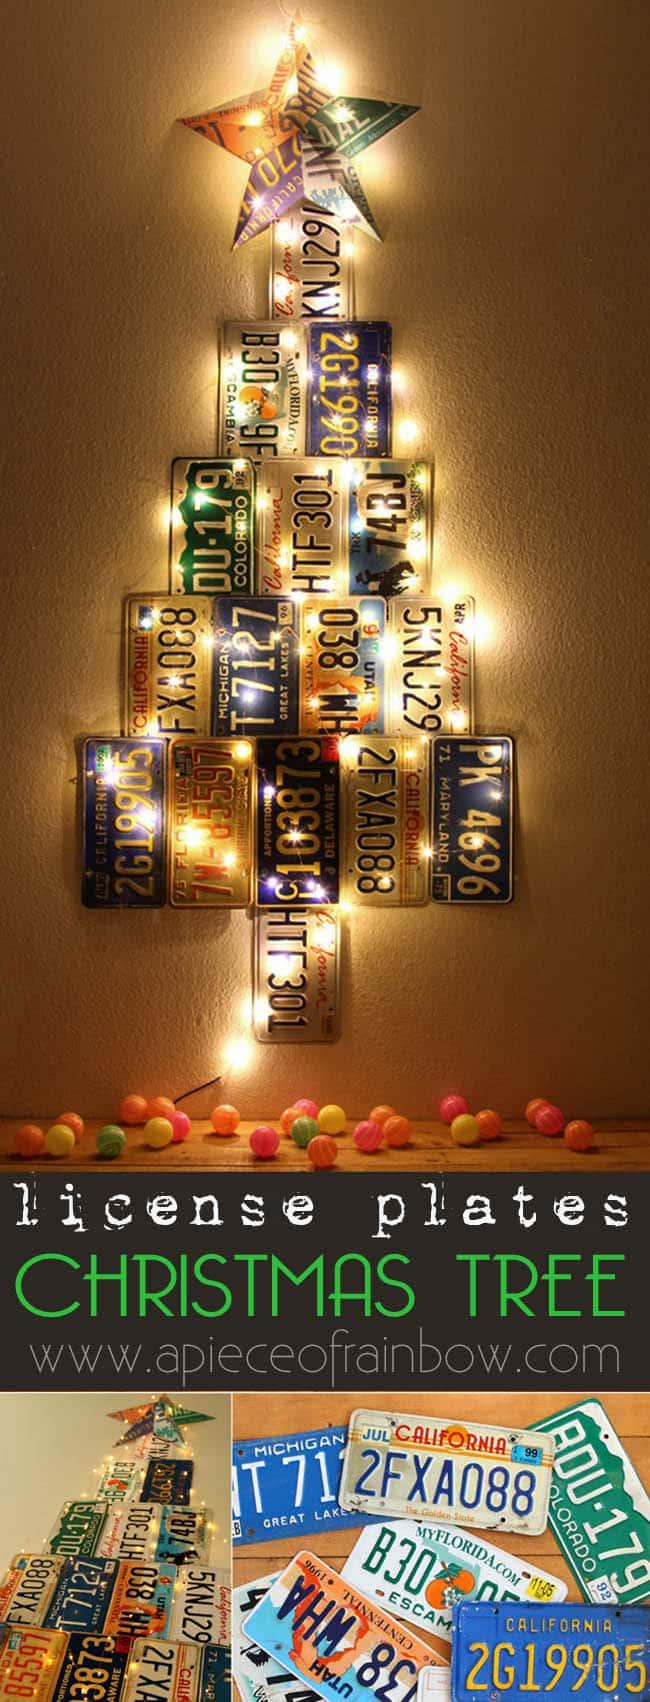 license-plate-christmas-tree-apieceofrainbowblog